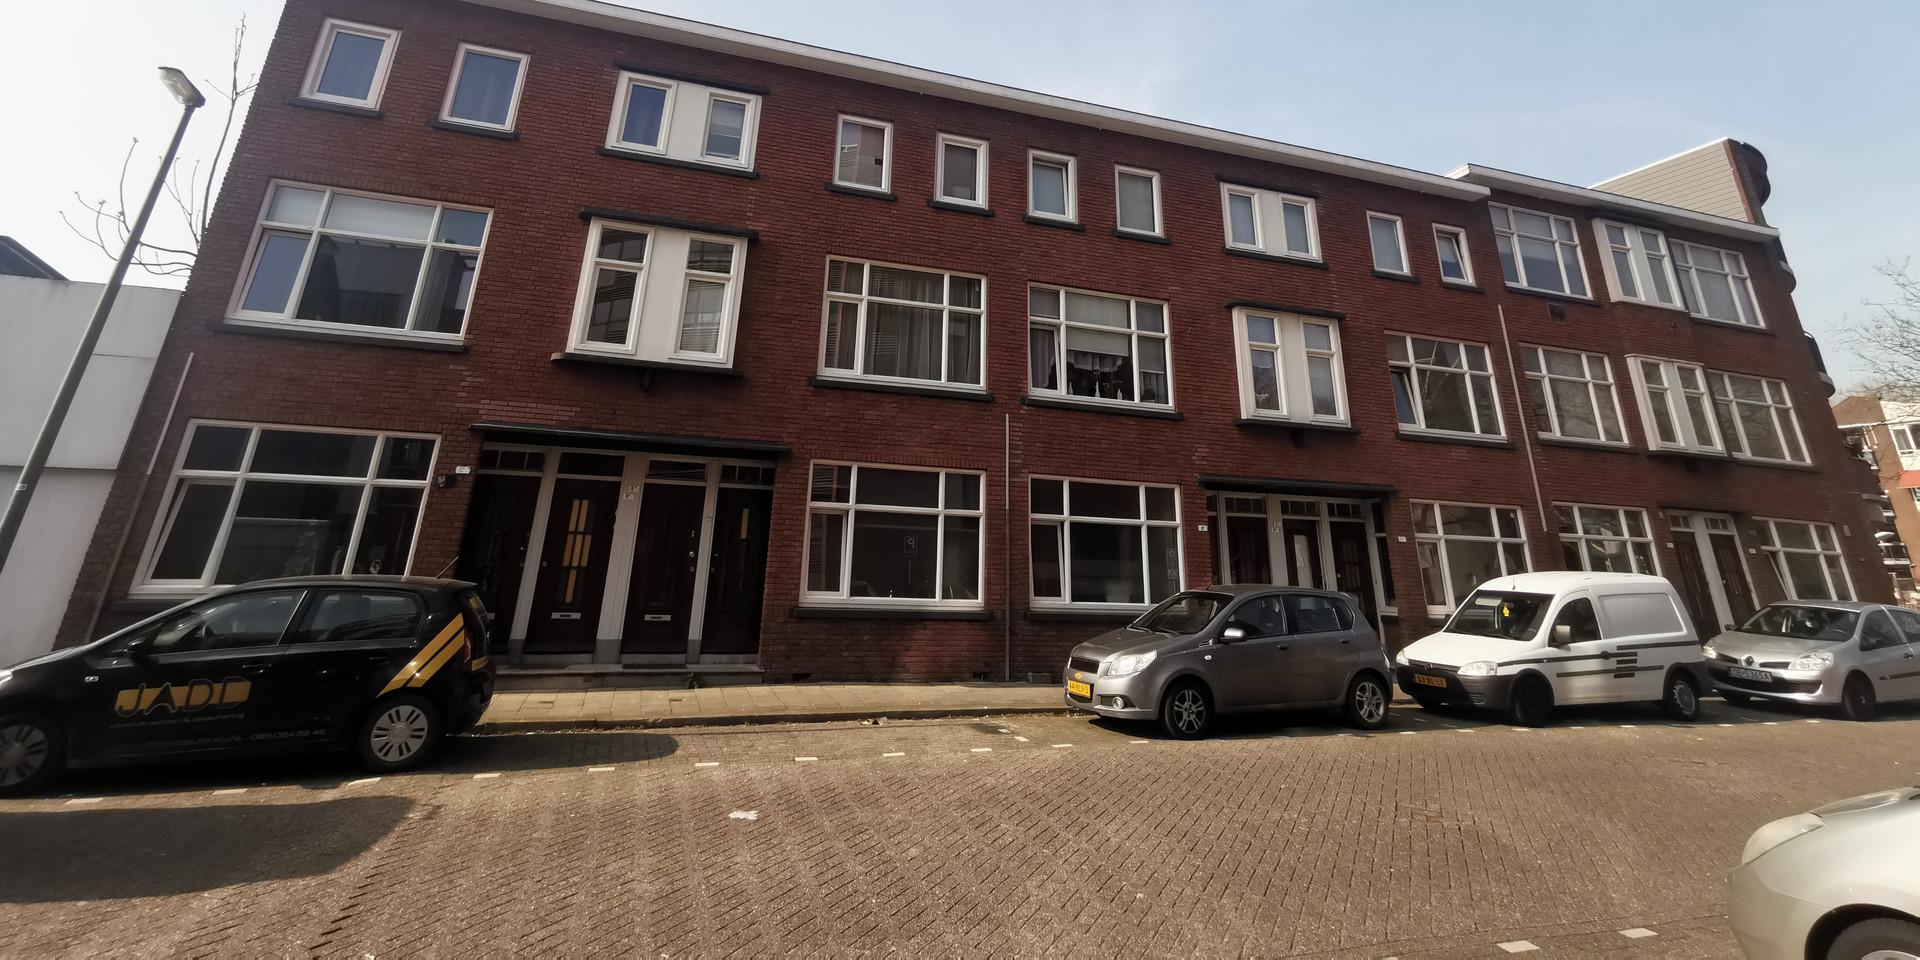 Westfrankelandsestraat 2